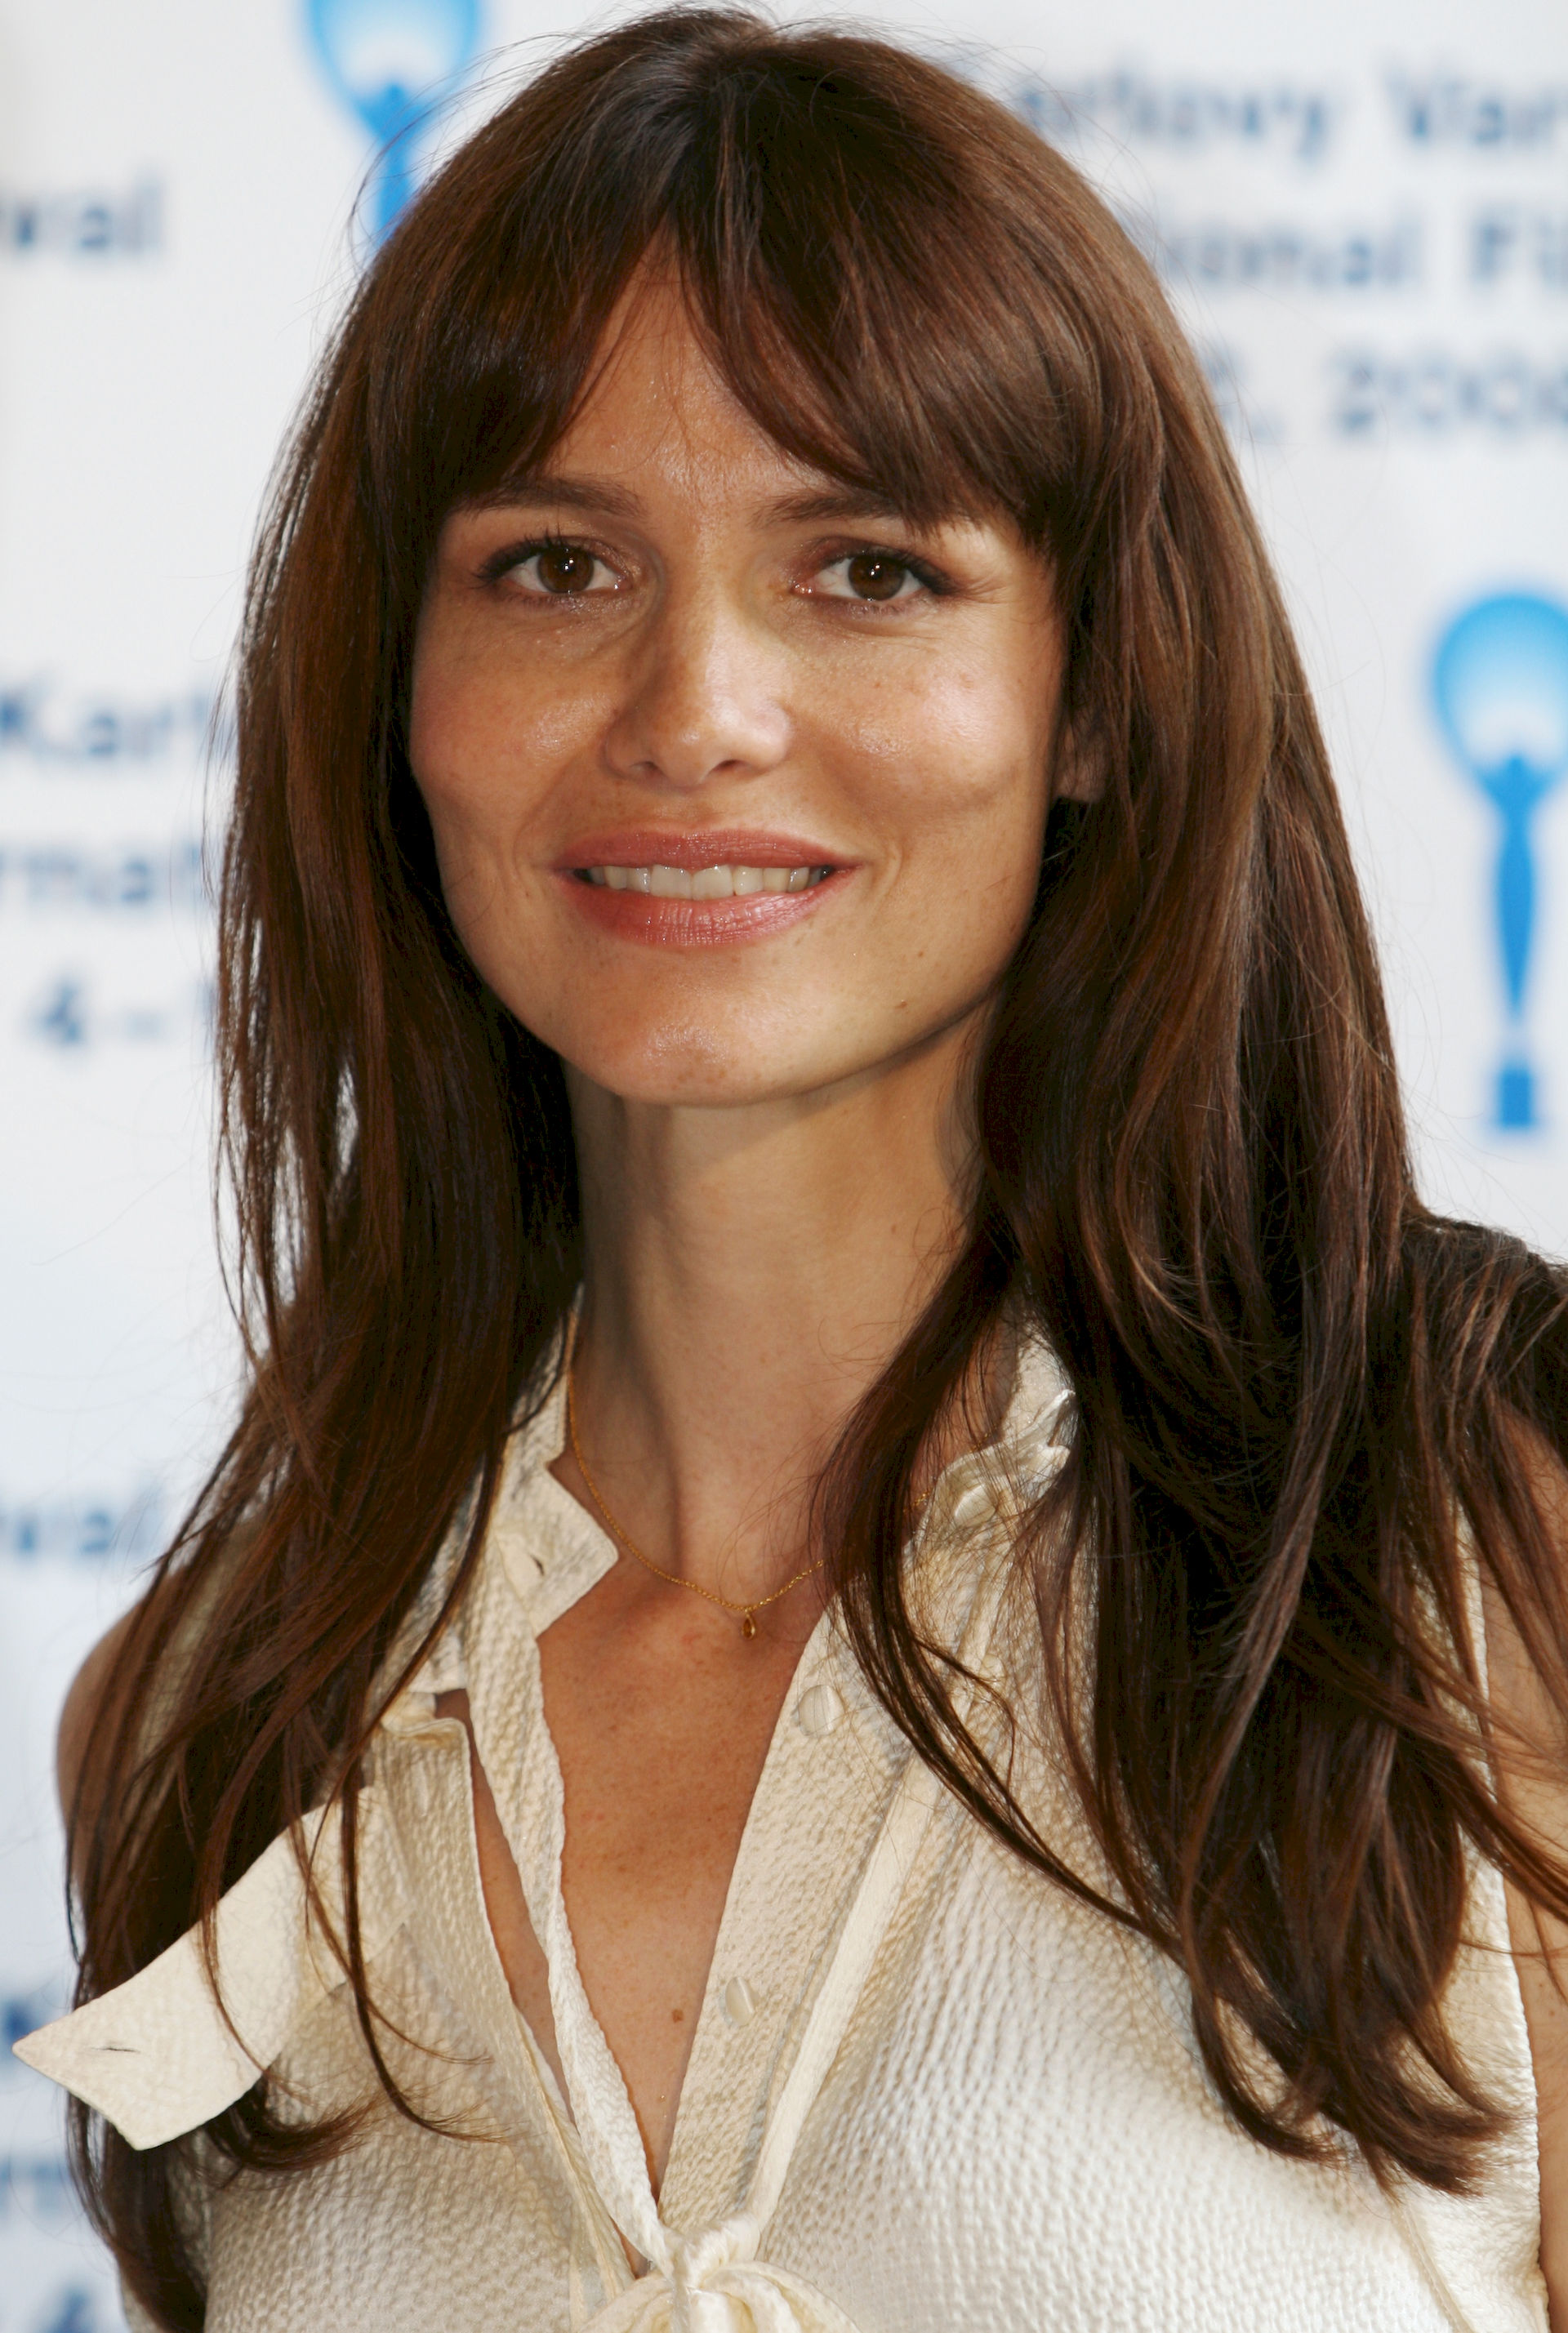 Photo of Saffron Burrows: English actress, model and writer